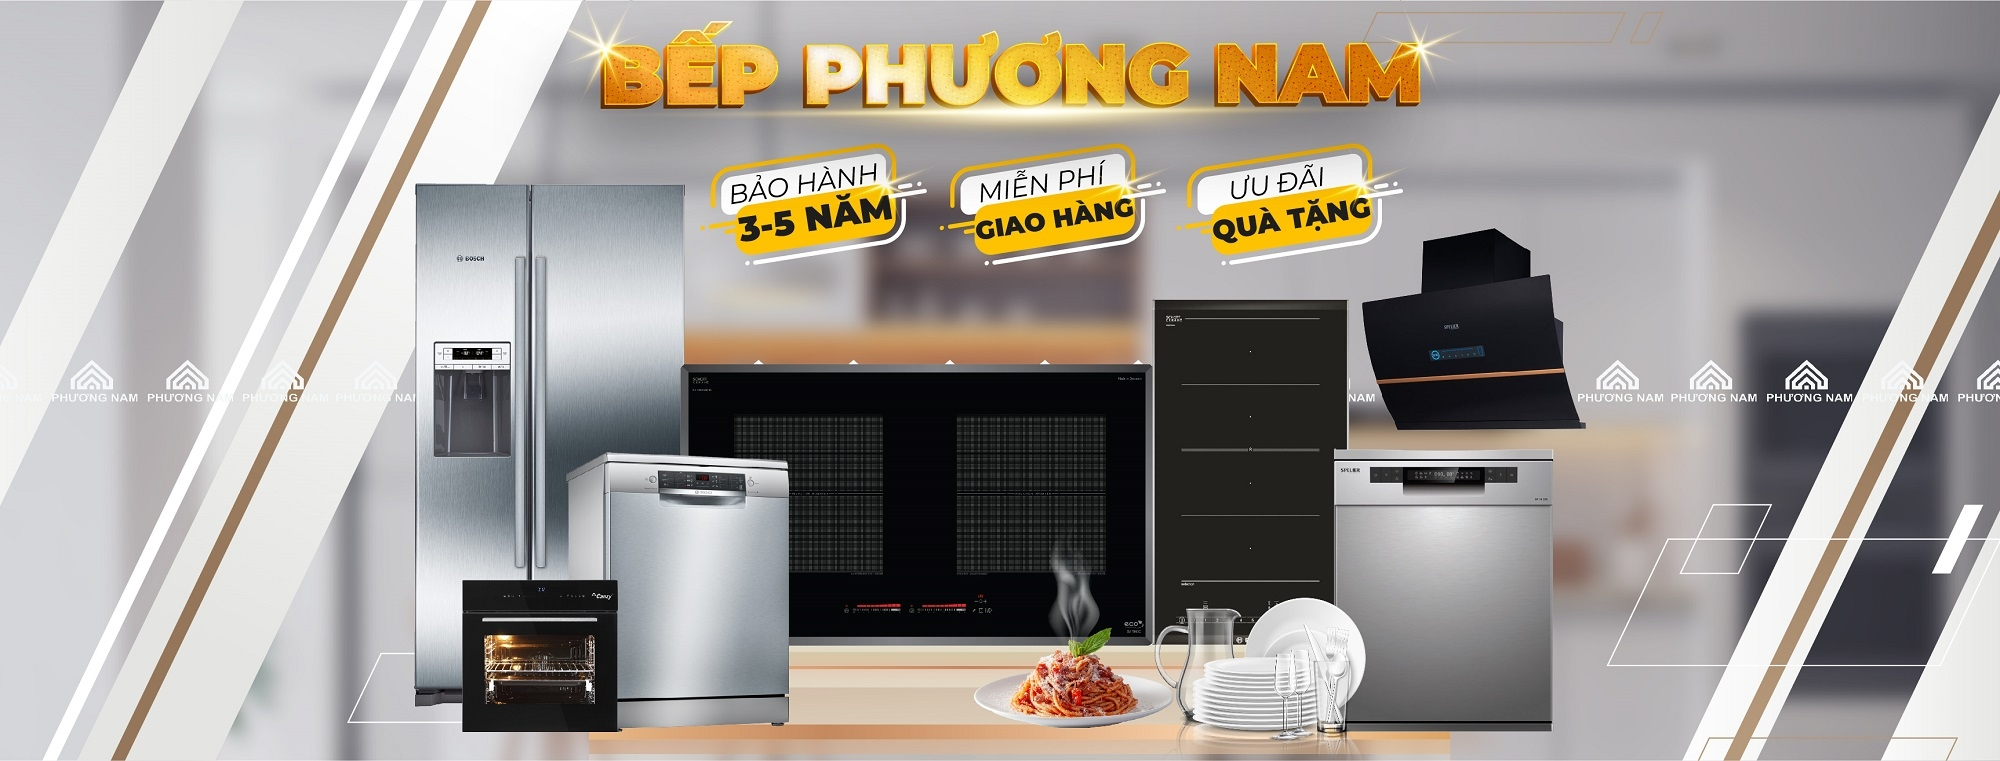 Bếp Phương Nam (@bepphuongnam) Cover Image